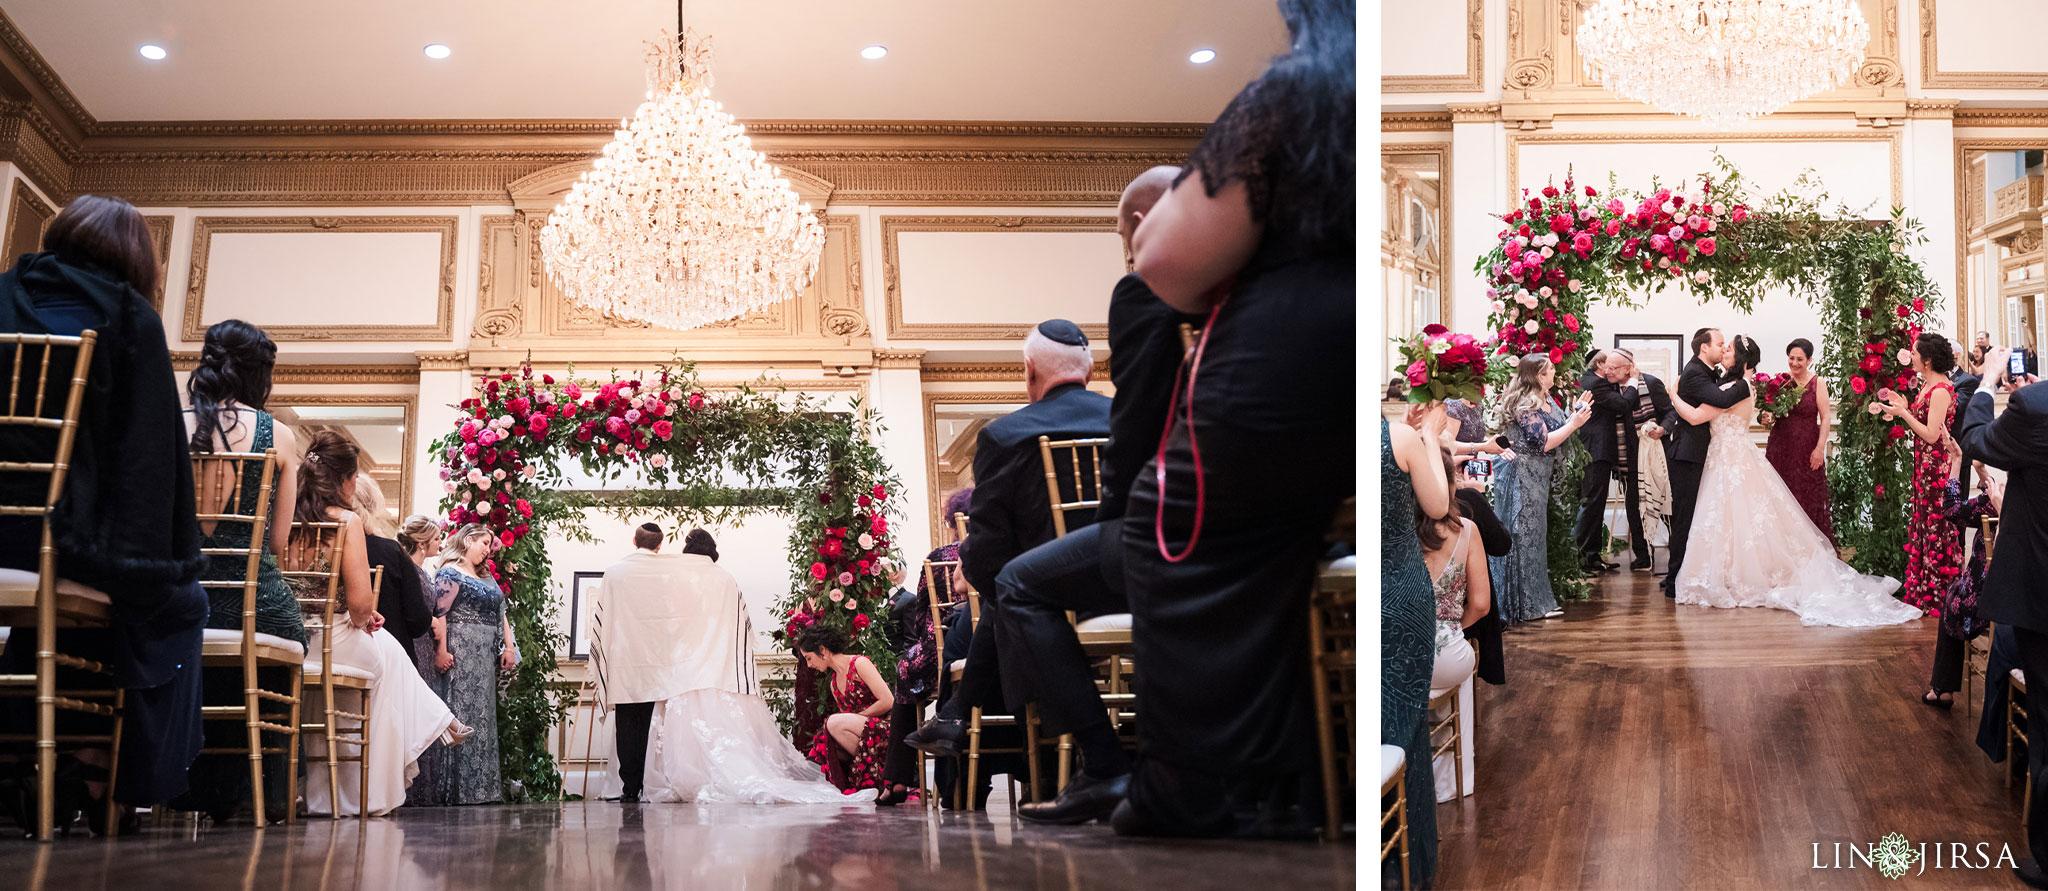 19 Alexandria Ballrooms Los Angeles Jewish Wedding Photography